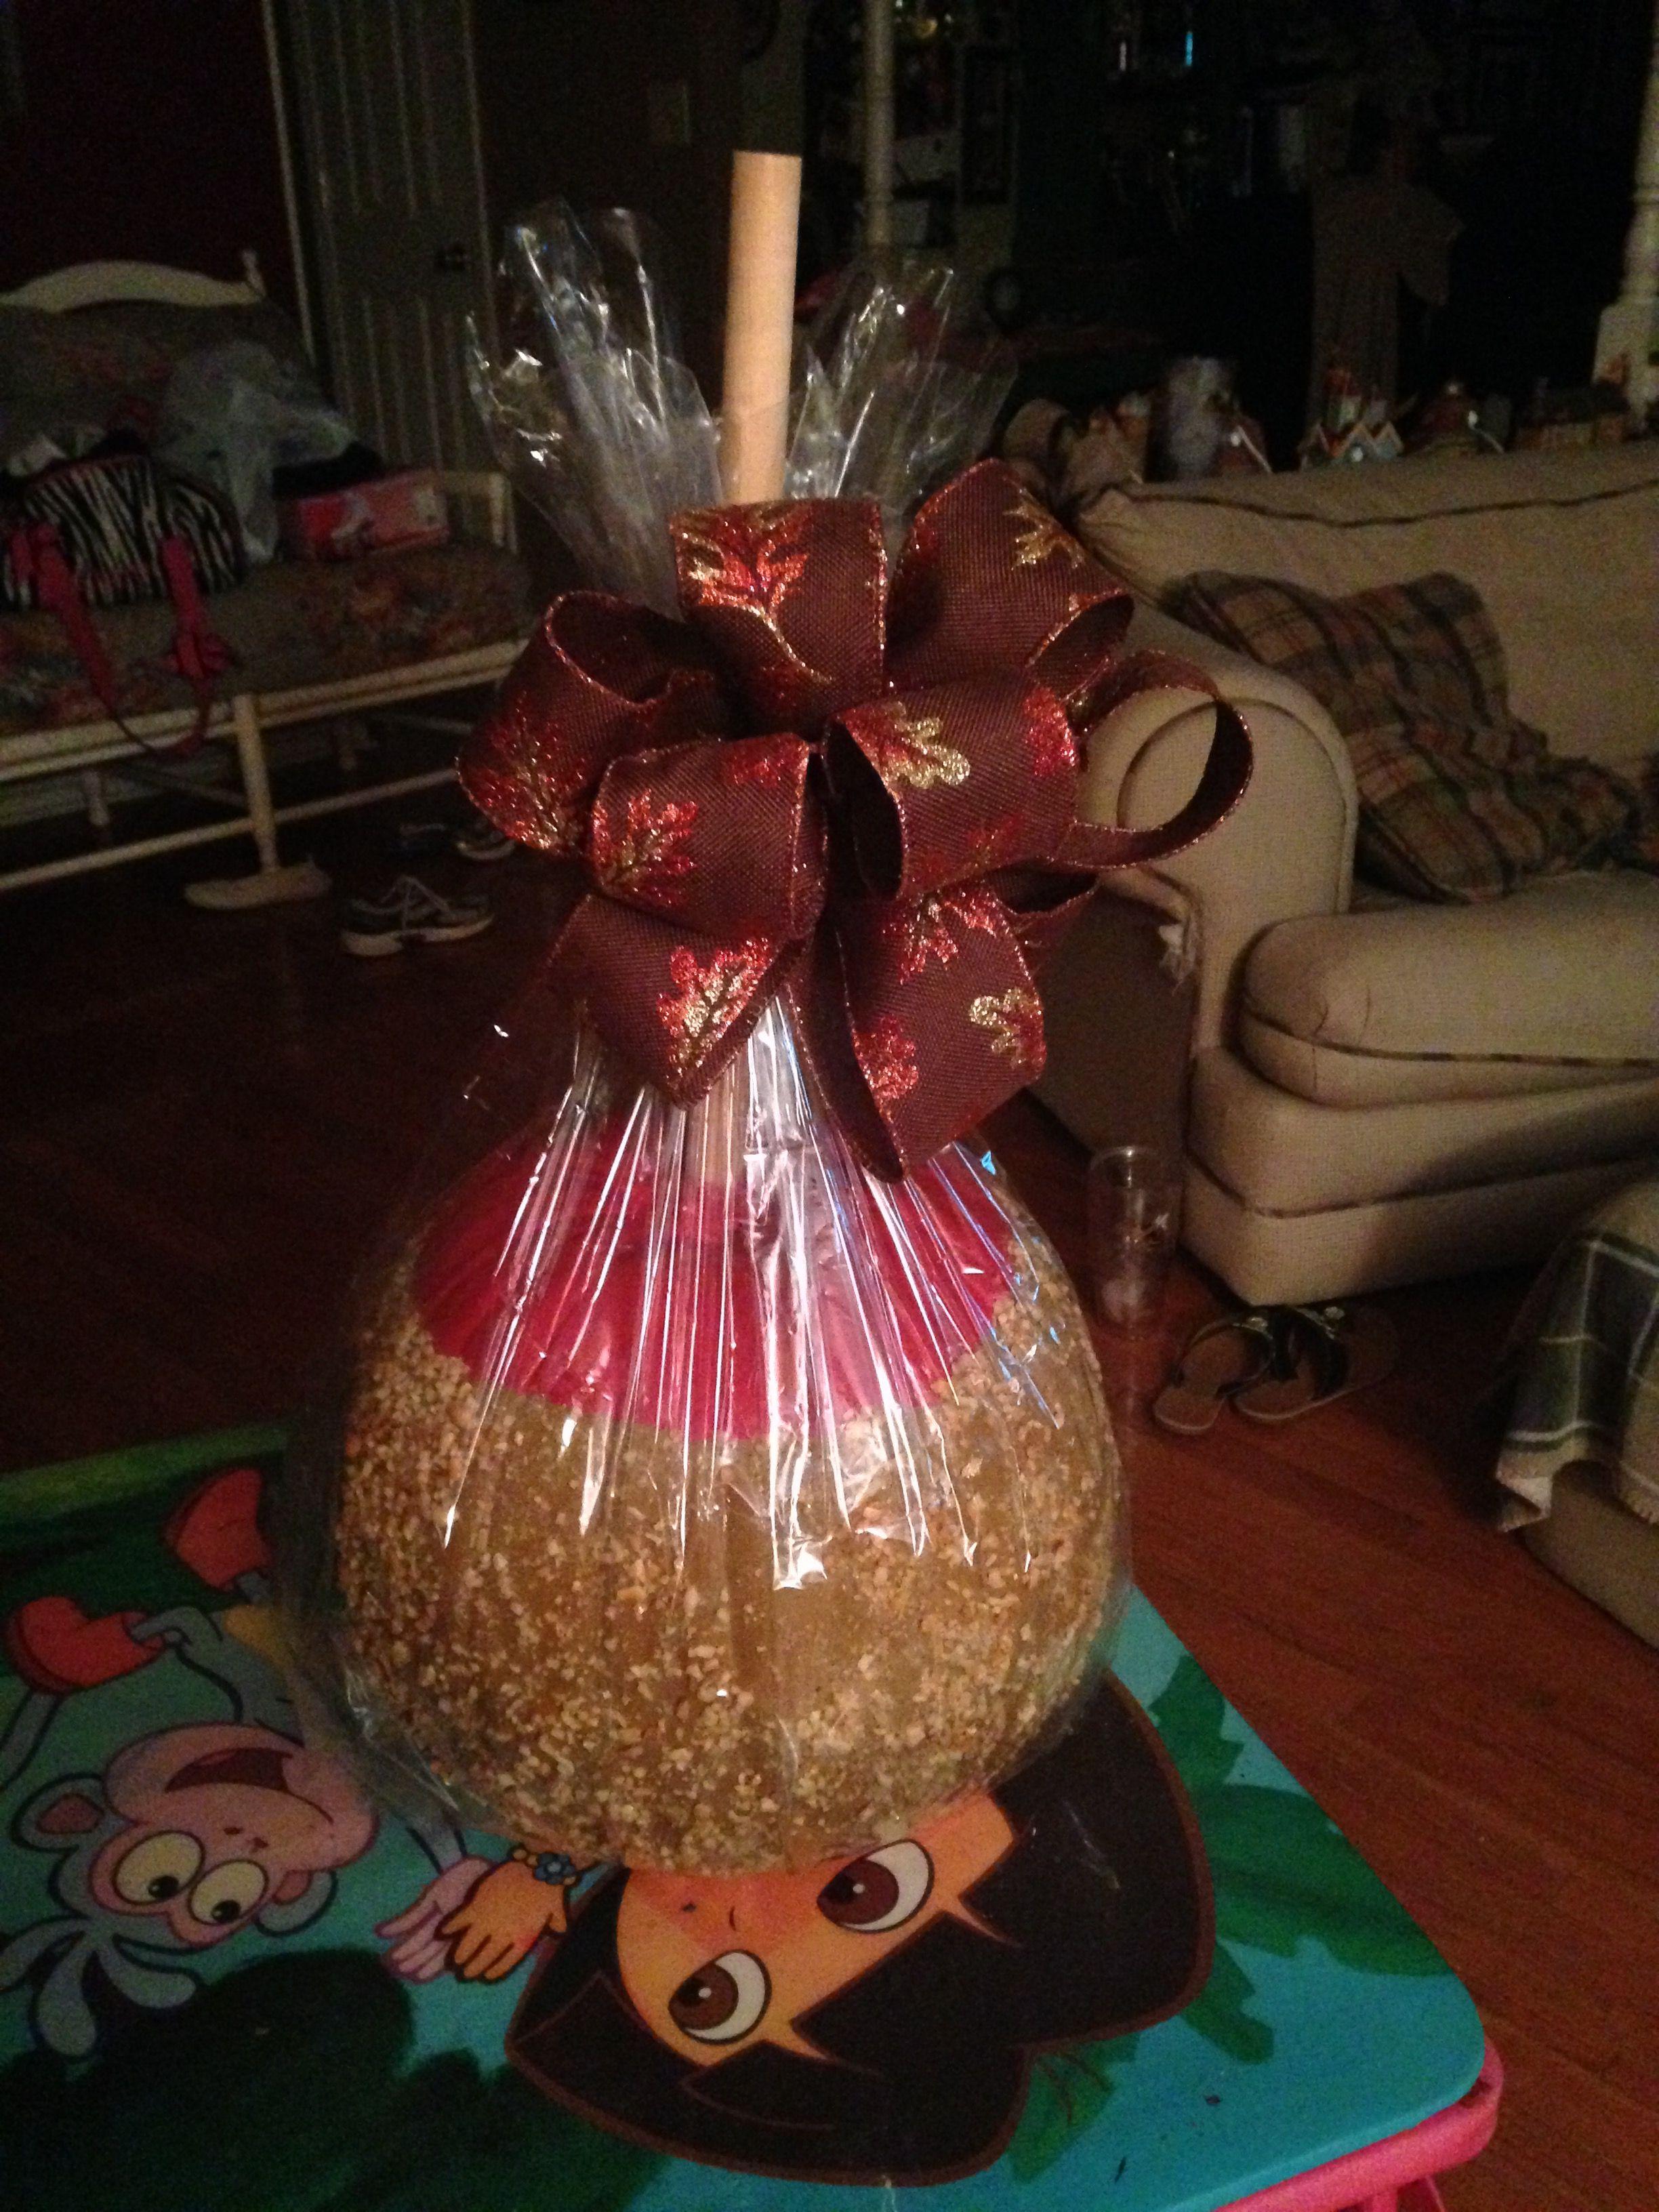 Caramel apple pumpkin with nuts Pumpkin decorating